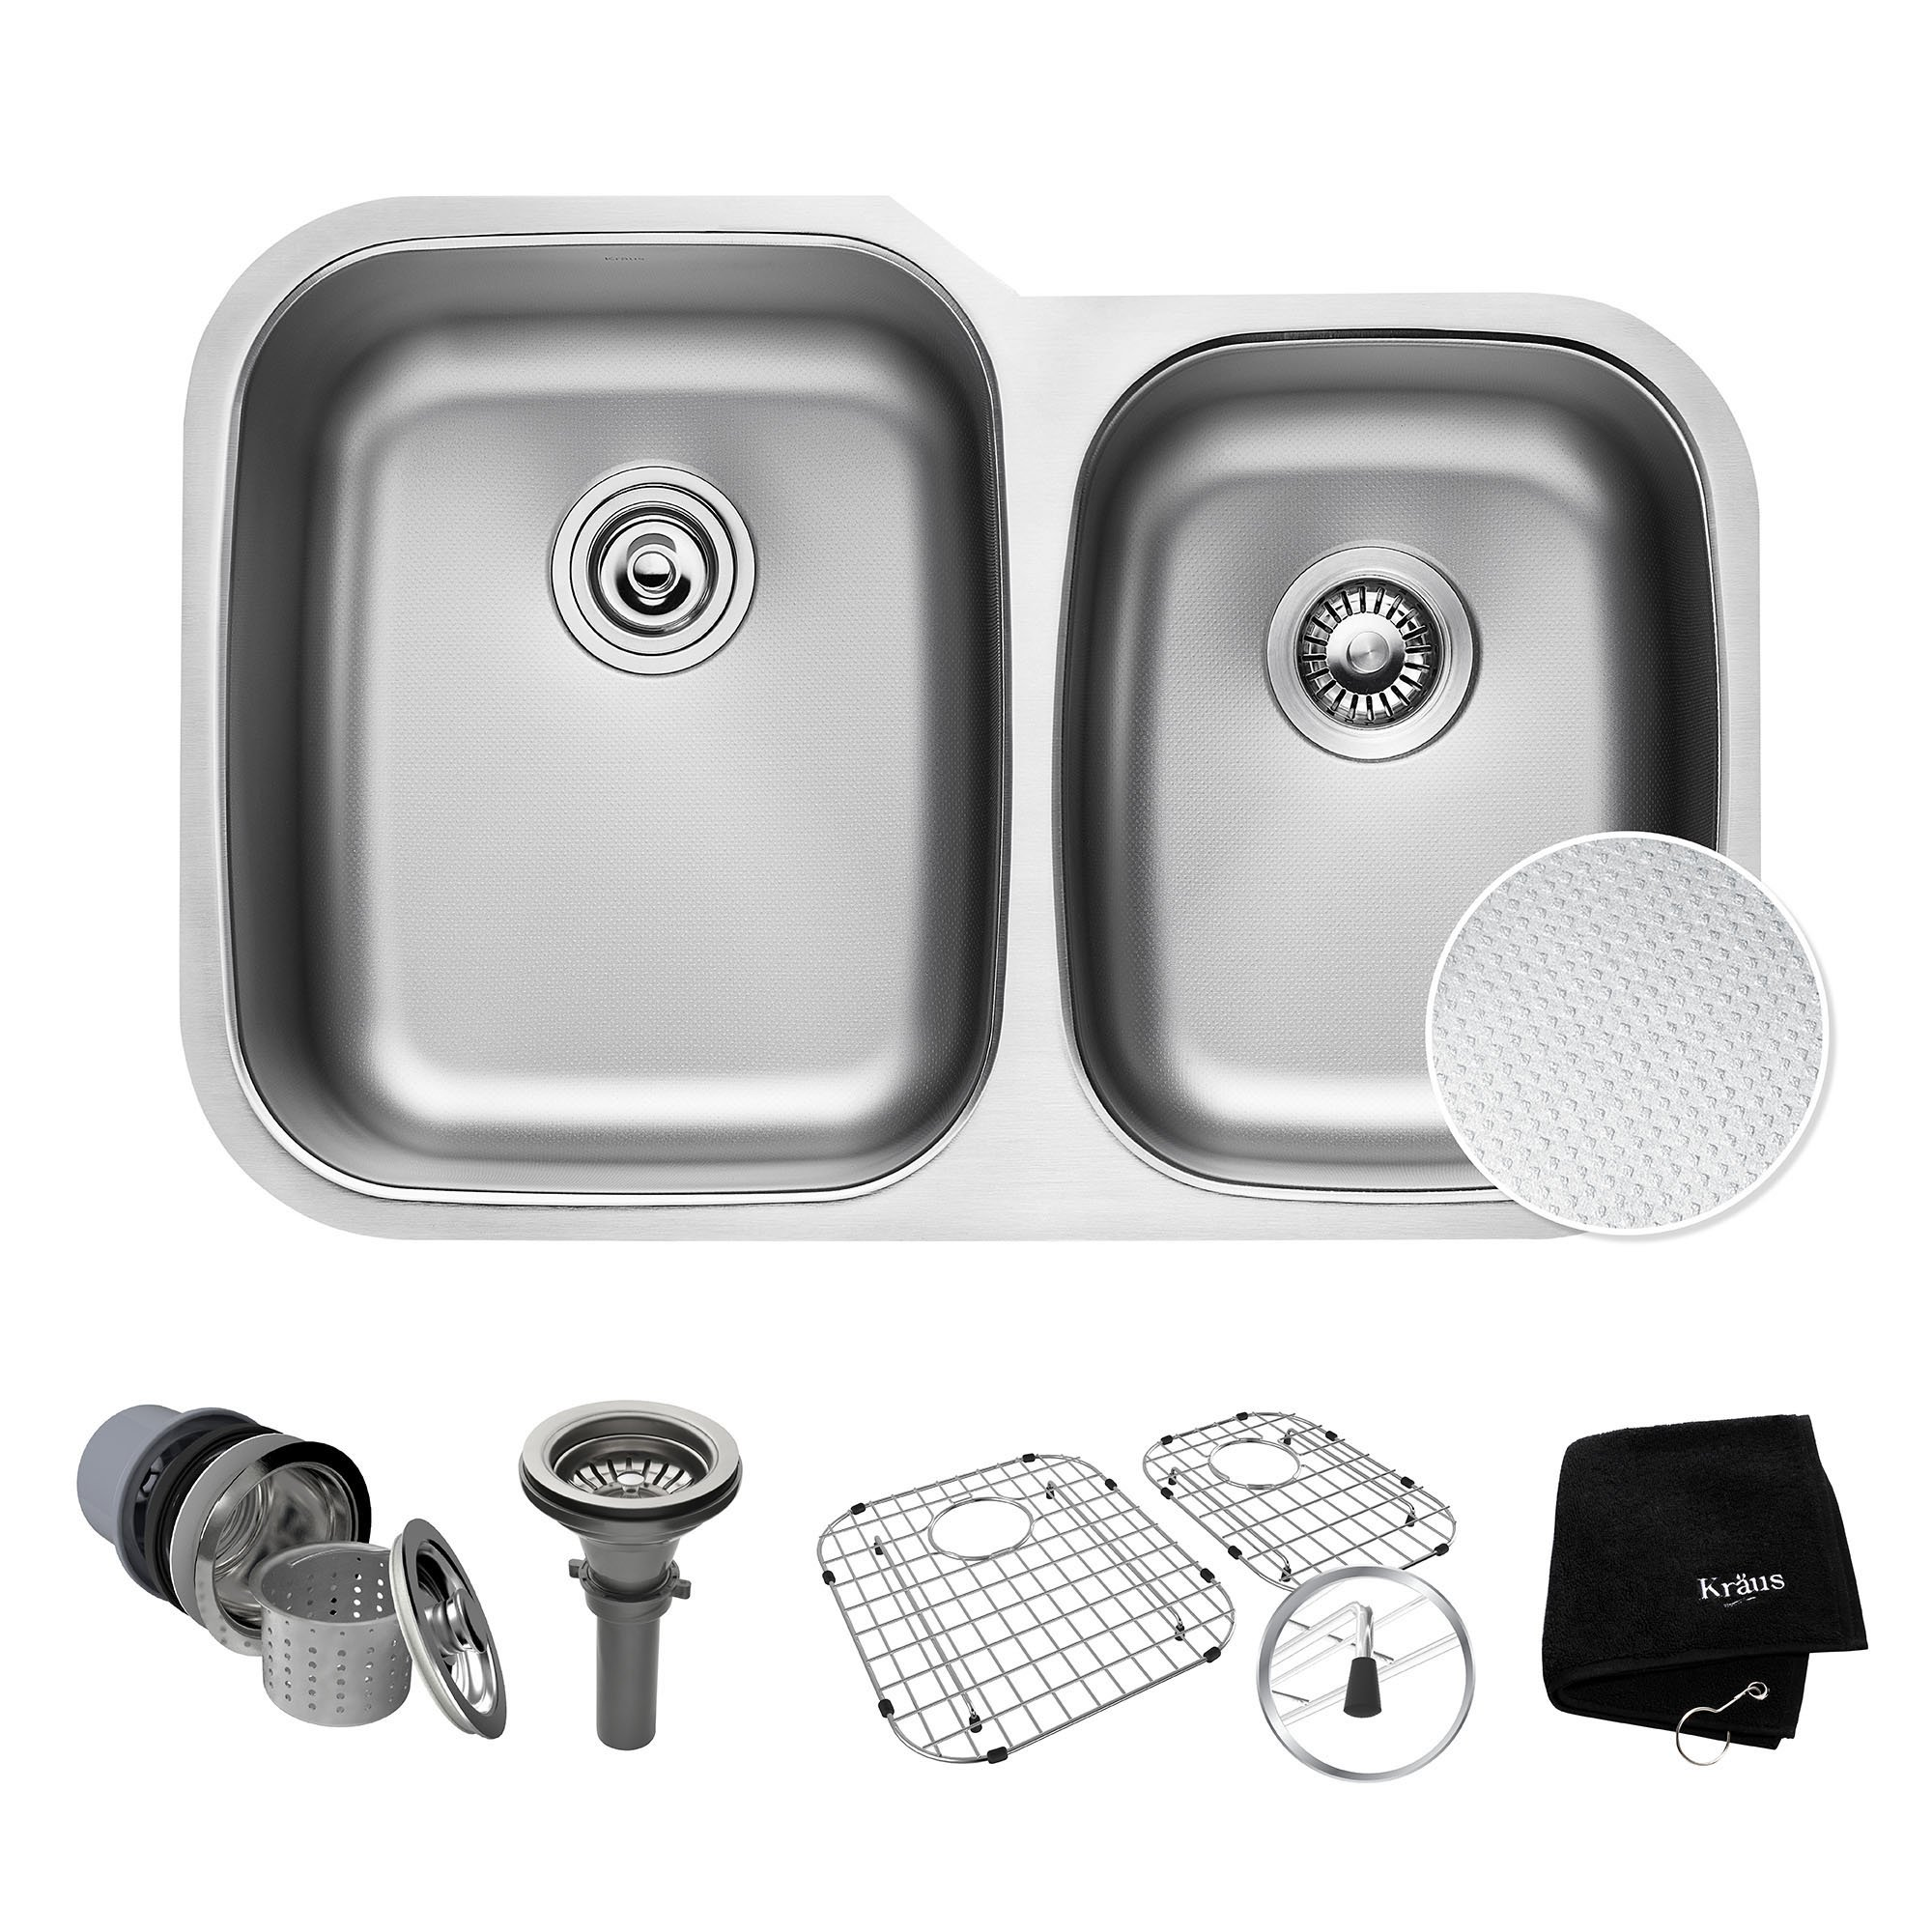 KRAUS Outlast MicroShield Scratch-Resist Stainless Steel Undermount 60/40 Double Bowl Sink, 32'' 16 Gauge, Premier Series KBU24E